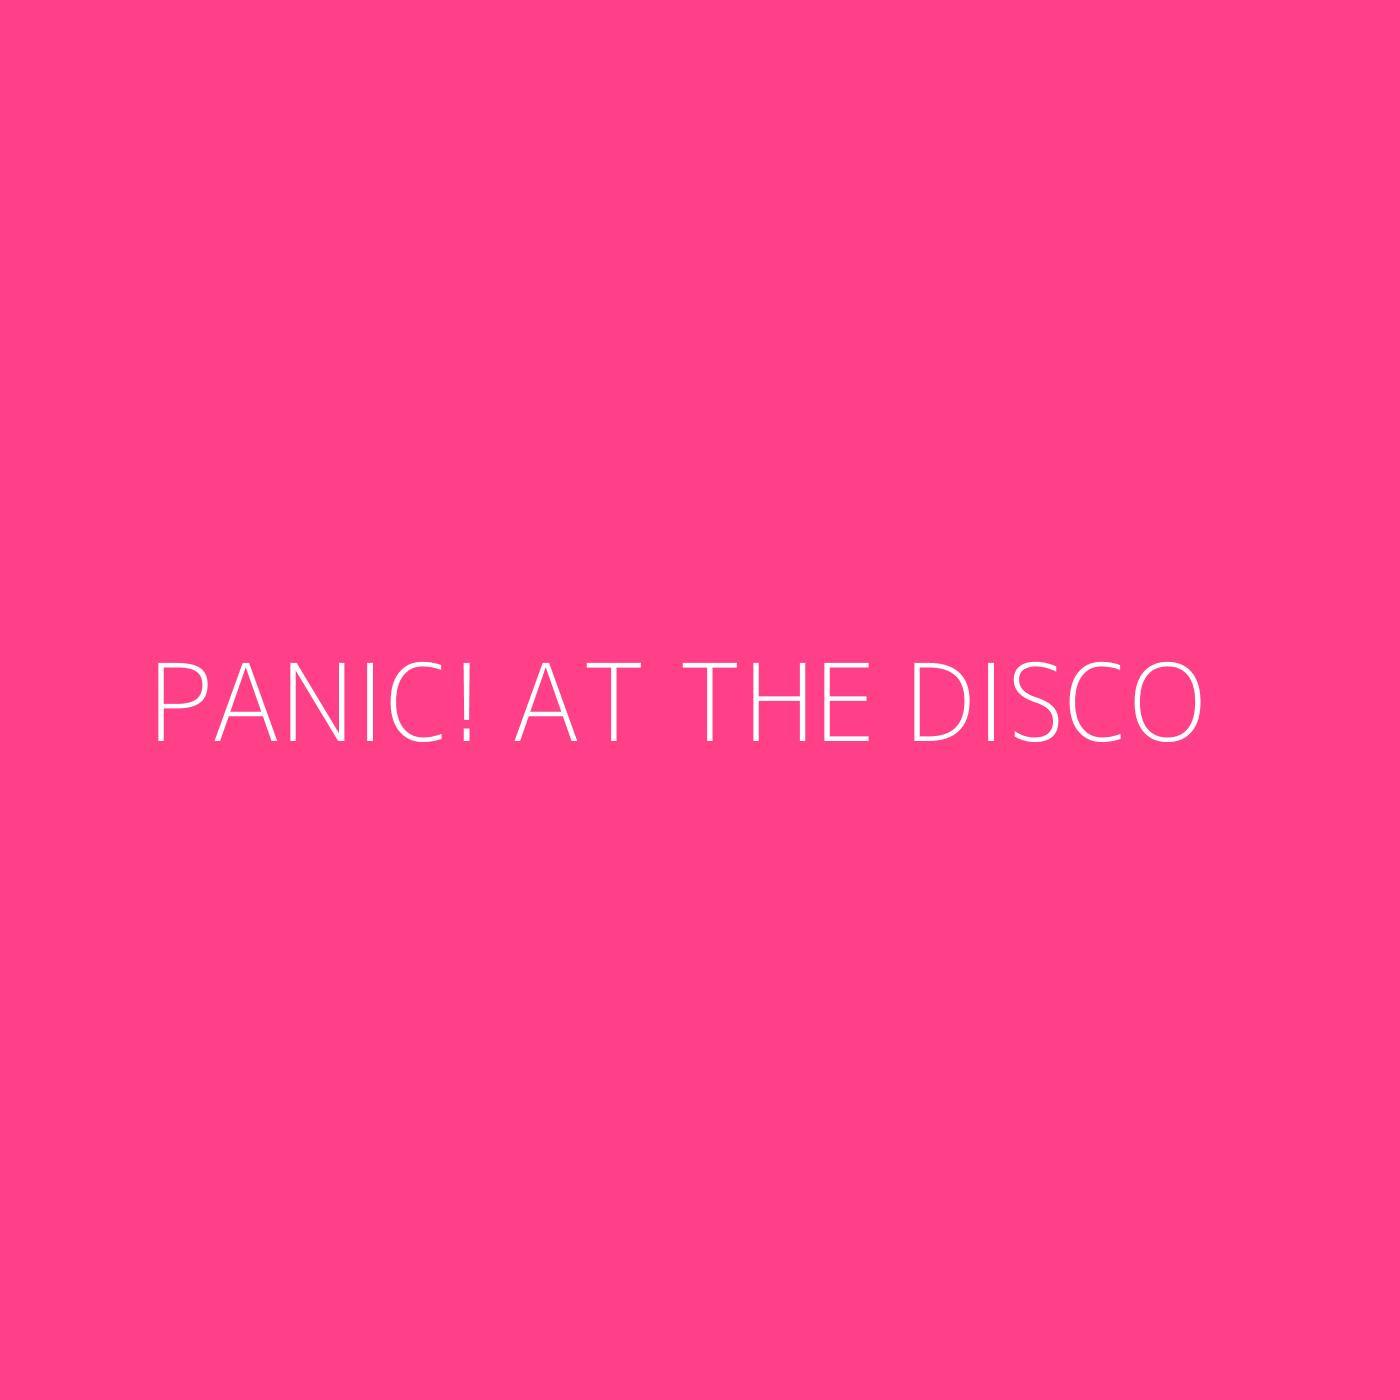 Panic! At The Disco Playlist Artwork